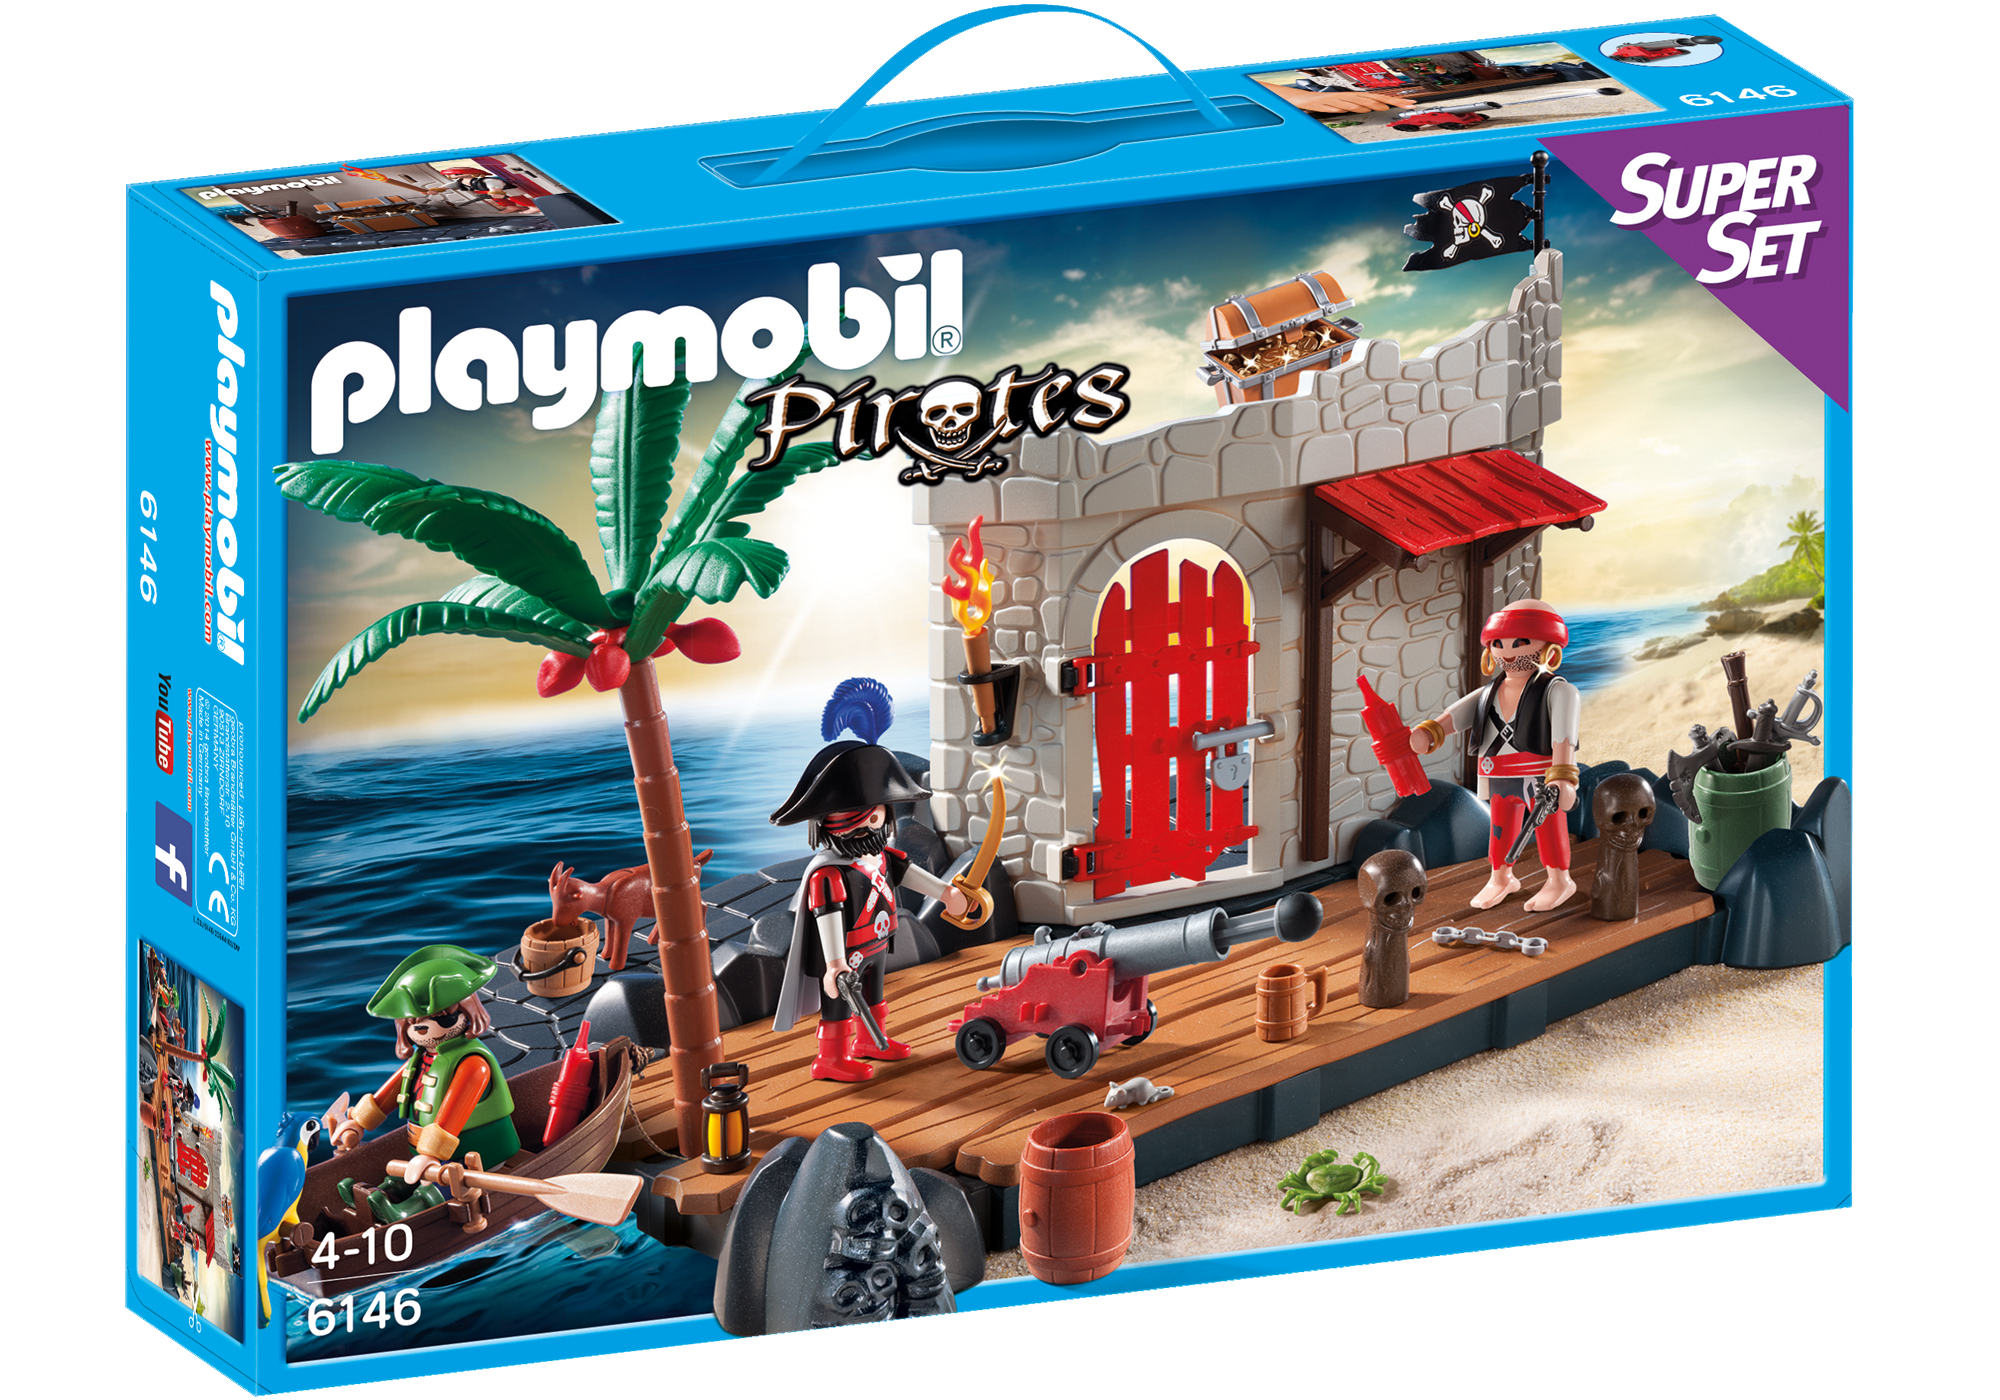 http://media.playmobil.com/i/playmobil/6146_product_box_front